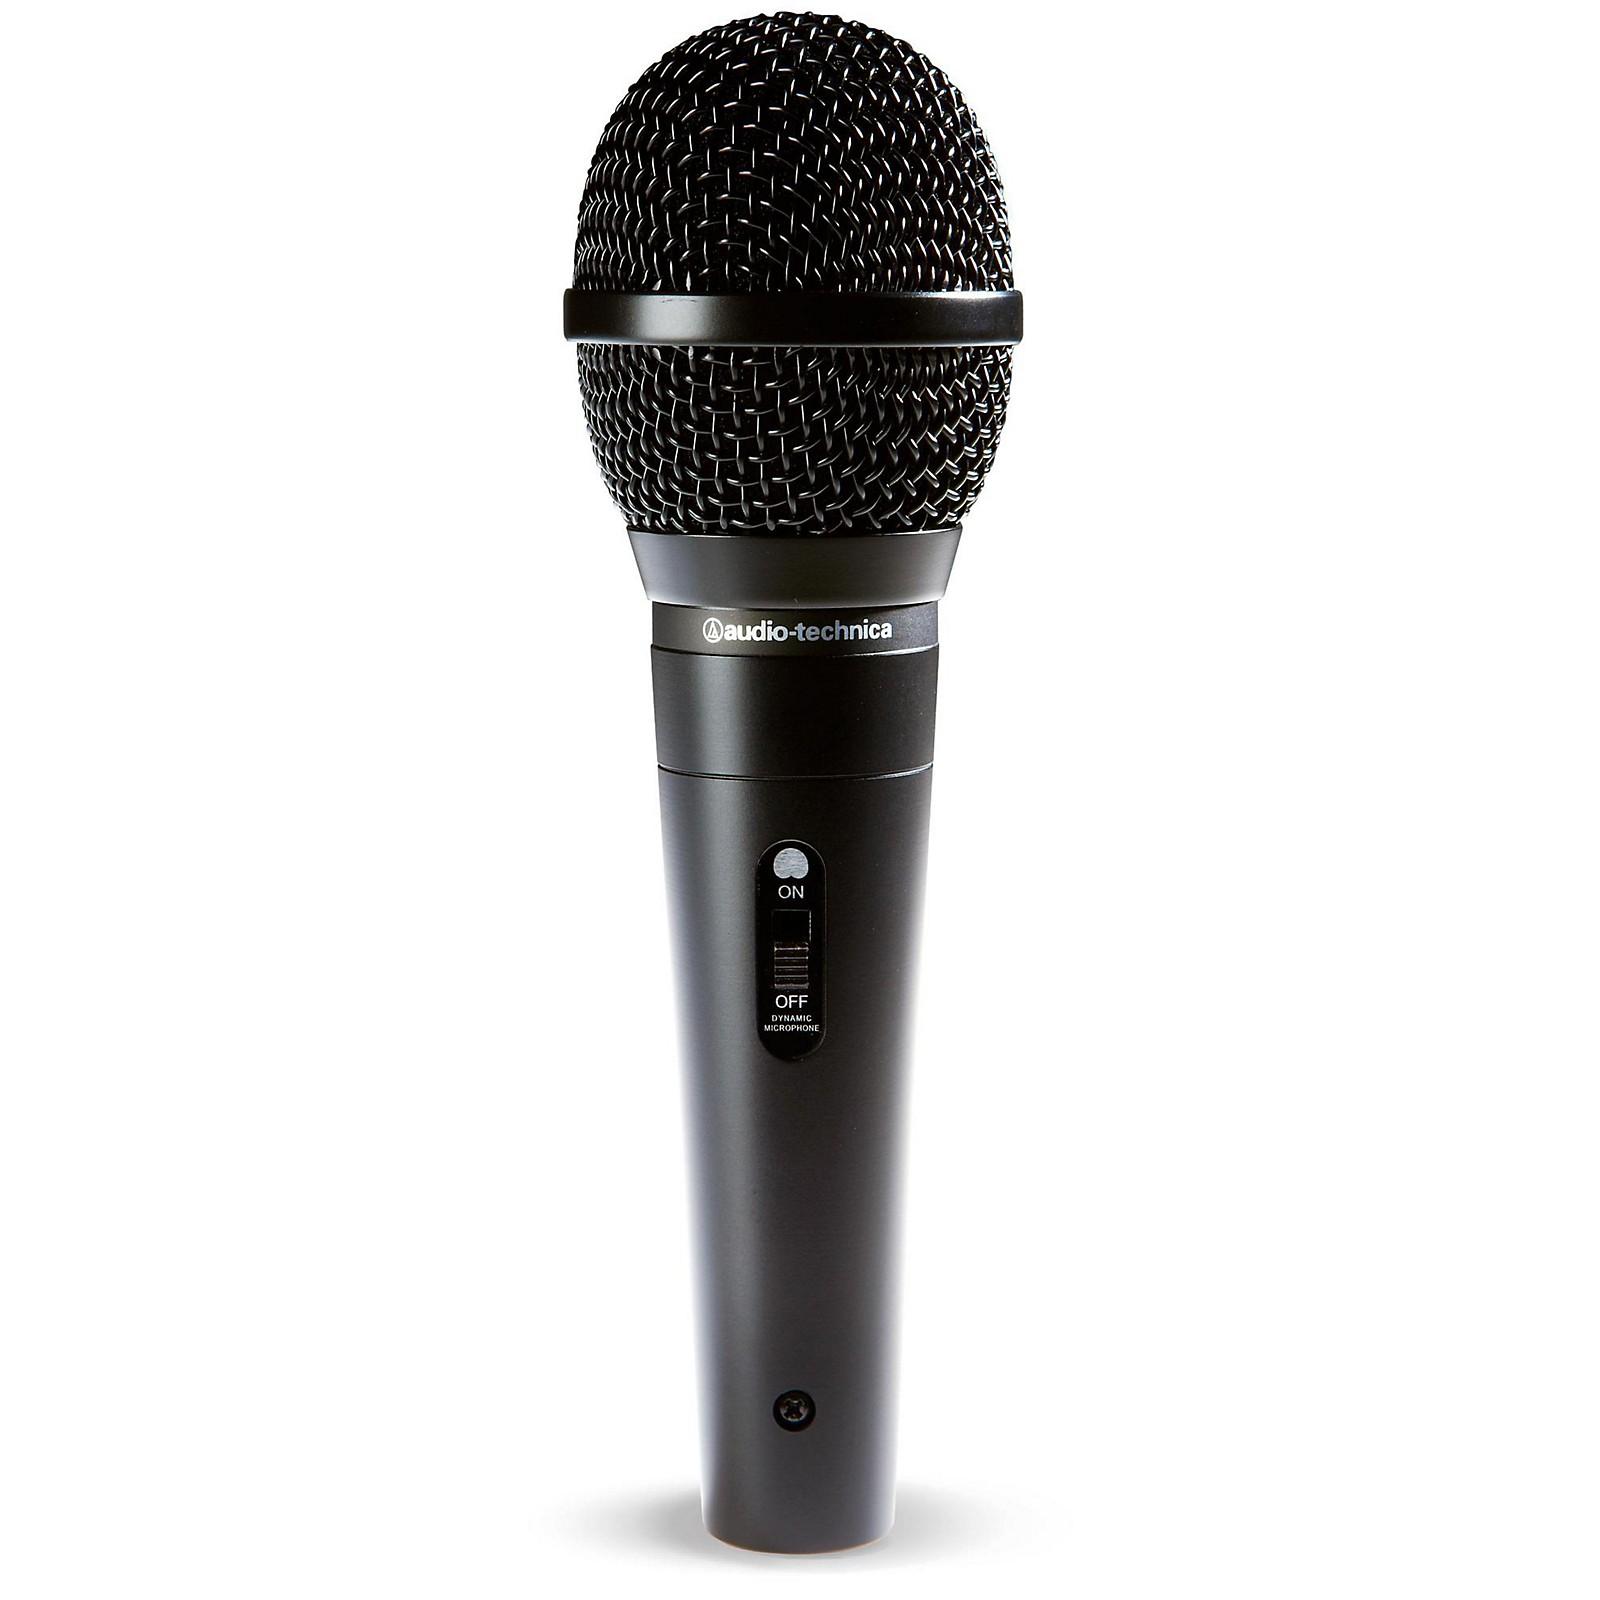 Open Box Audio-Technica M4000S Handheld Dynamic Microphone